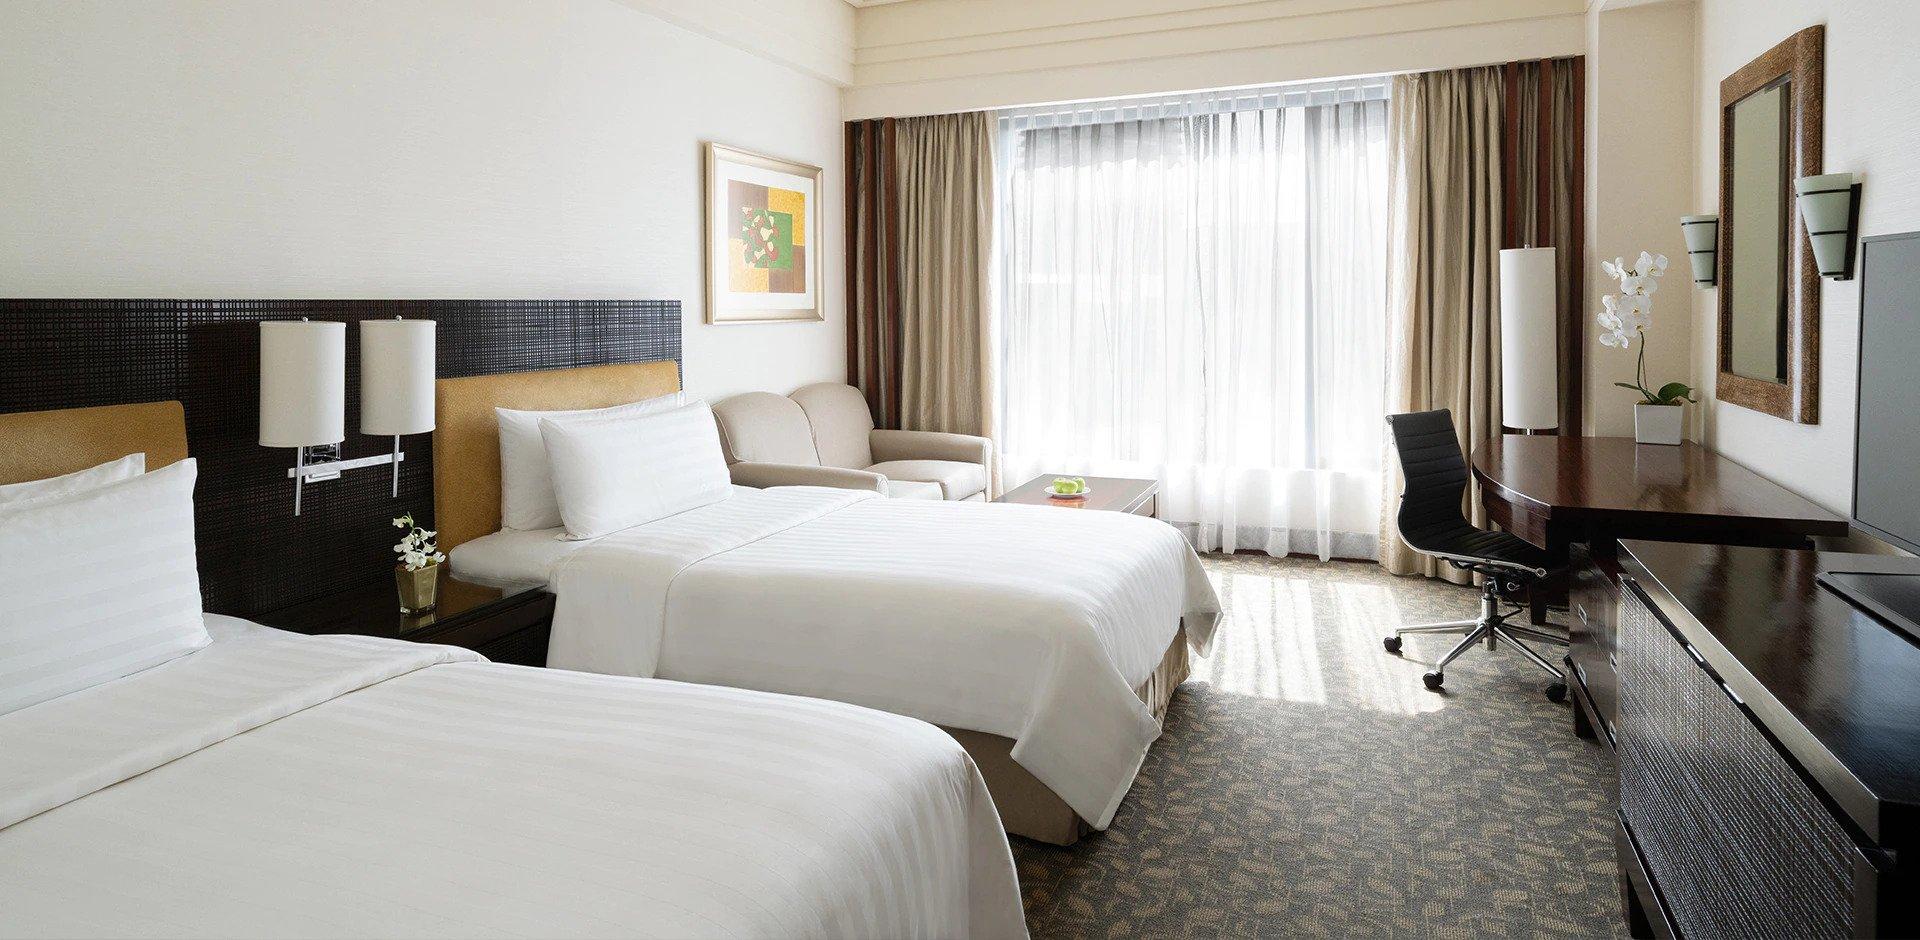 Twin beds inside a room in EDSA Shangri-la Hotel